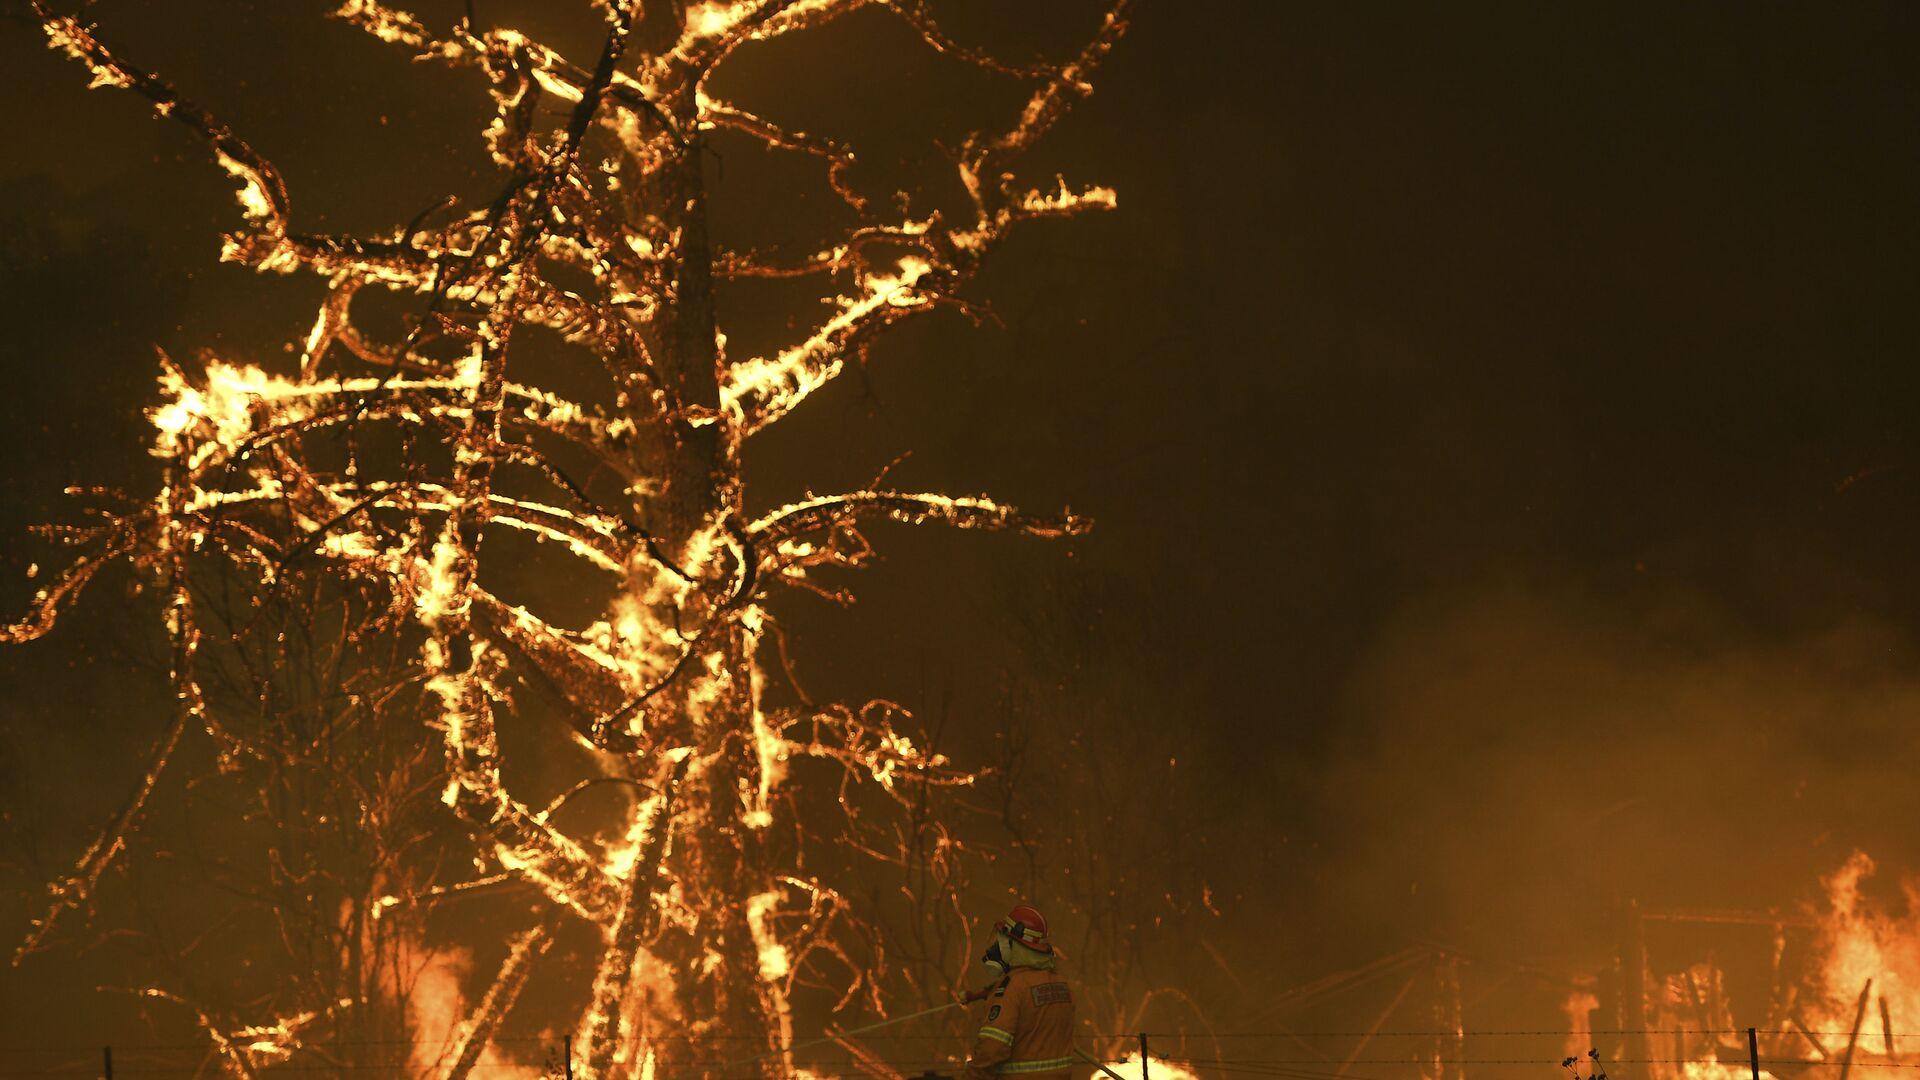 Gli incendi boschivi in Australia - Sputnik Italia, 1920, 13.08.2021